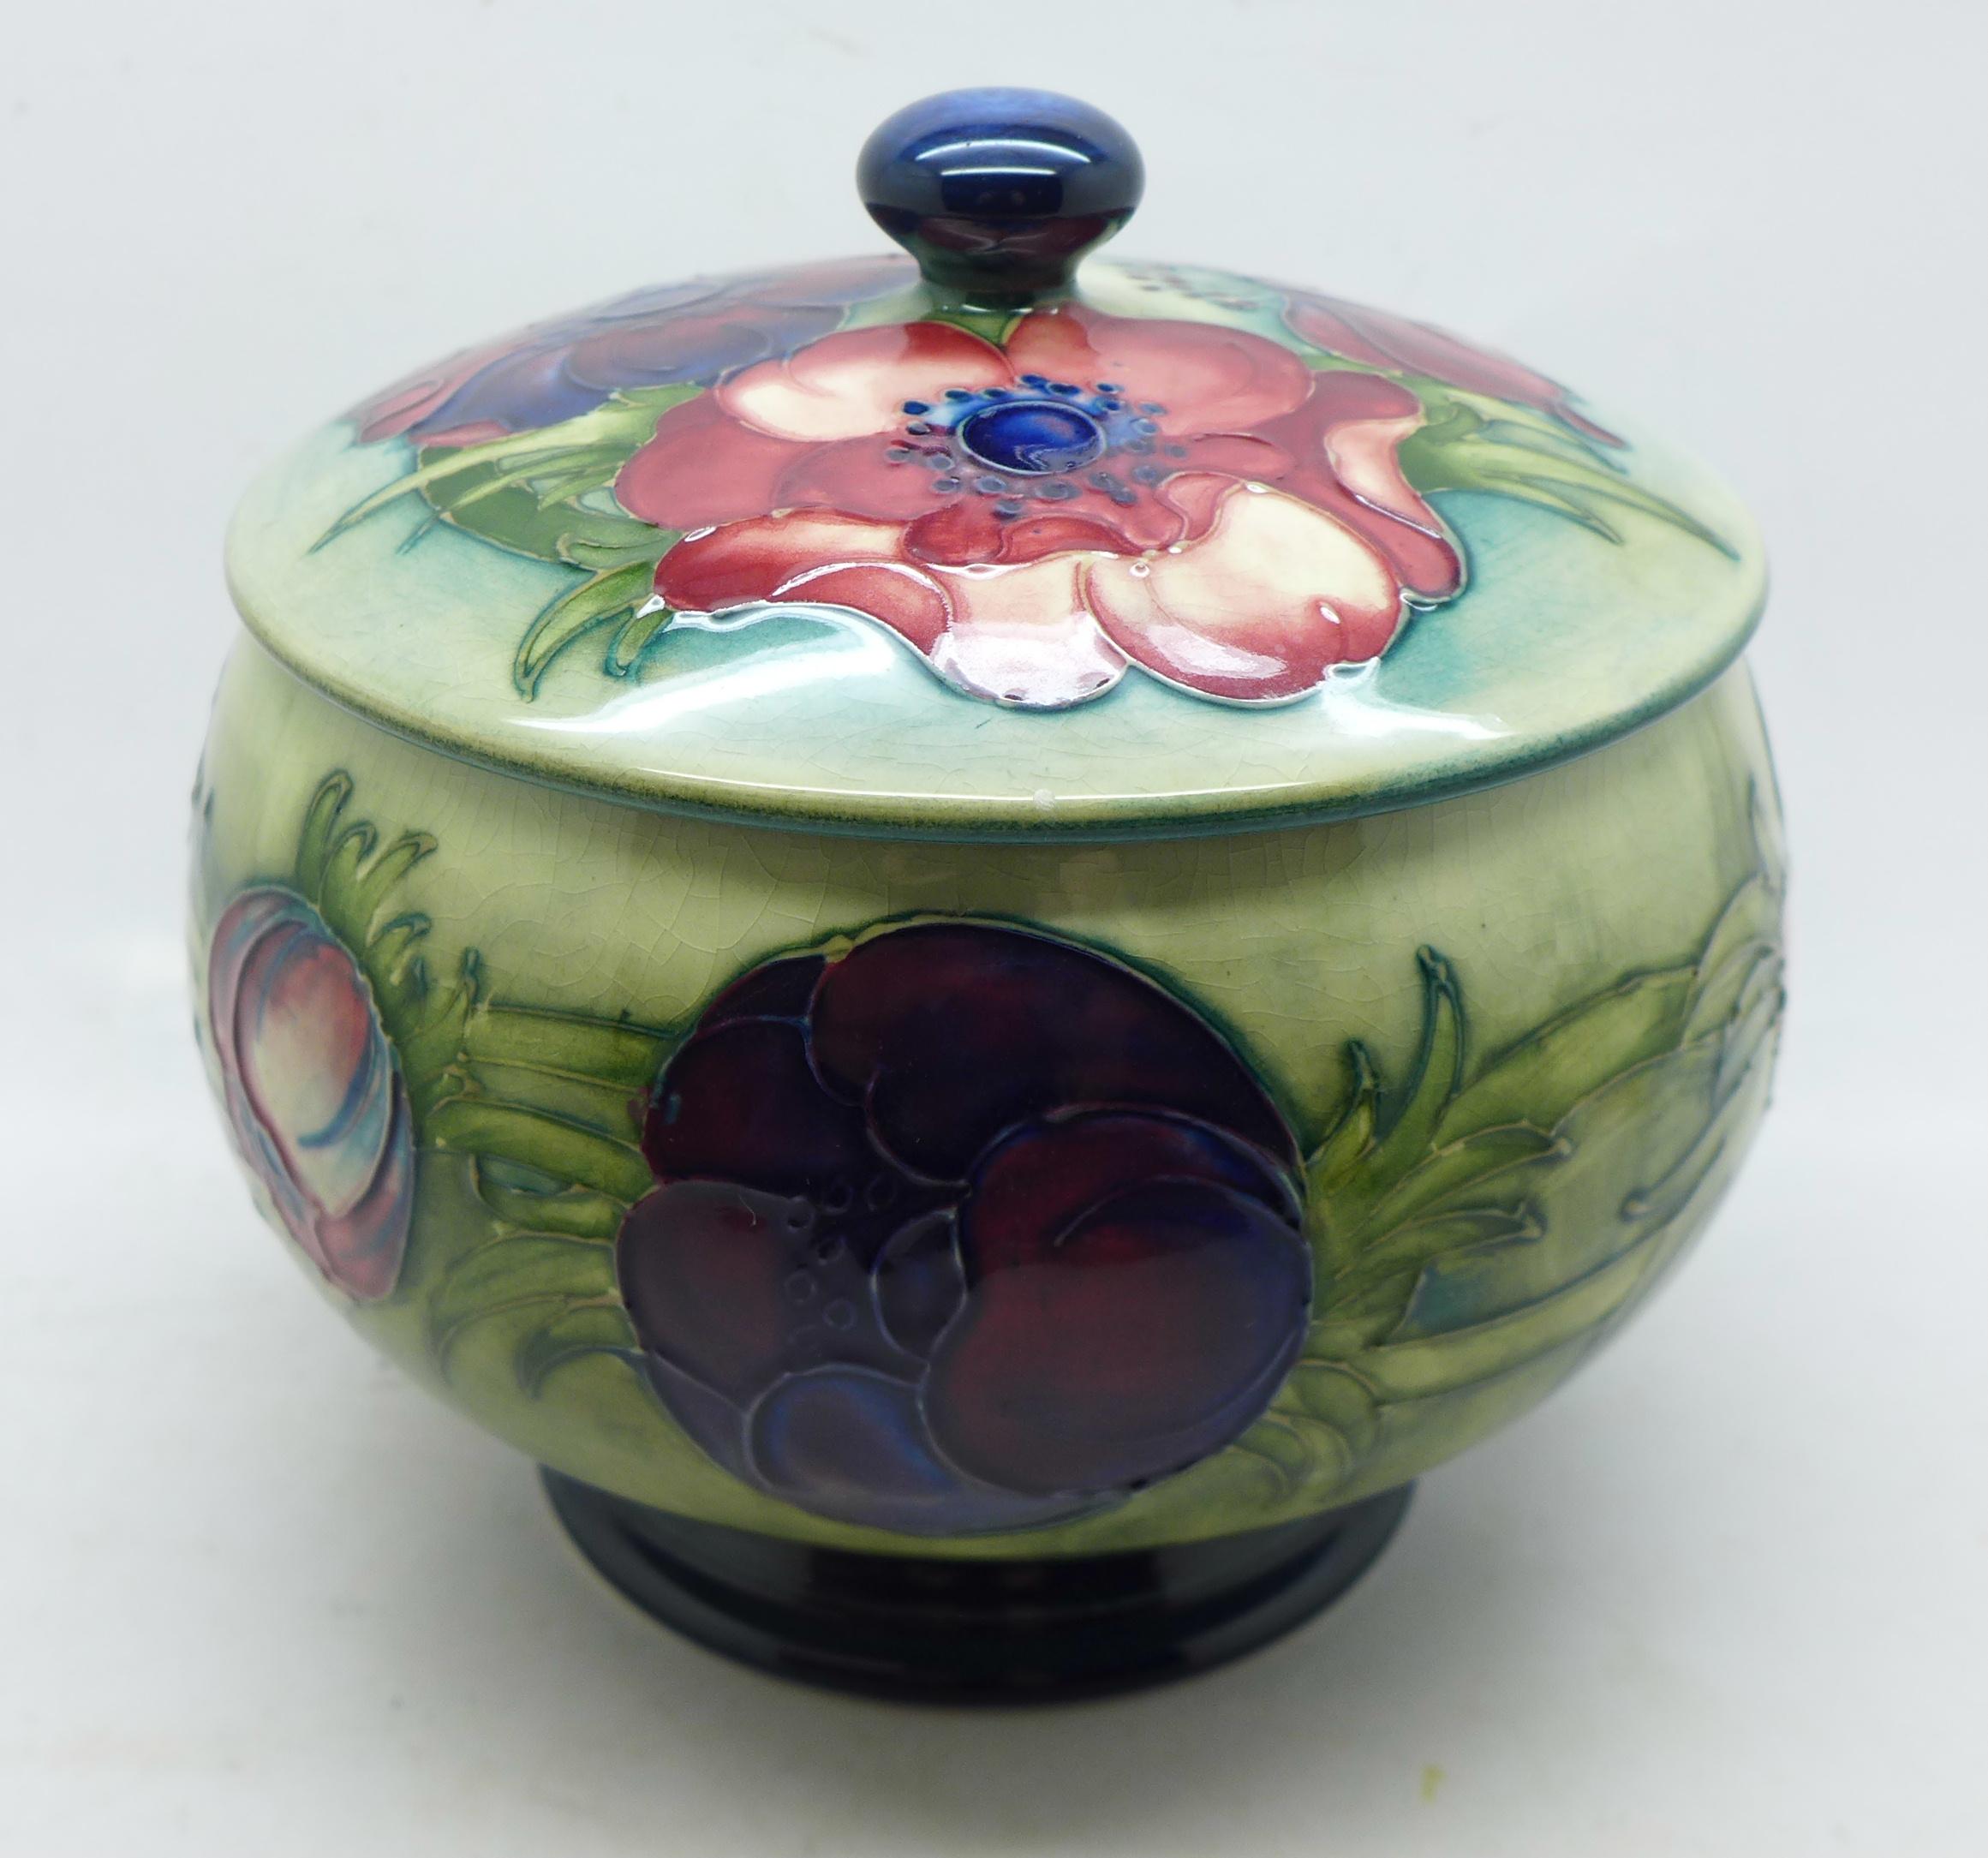 A Moorcroft anemone lidded pot, 12.5cm diameter